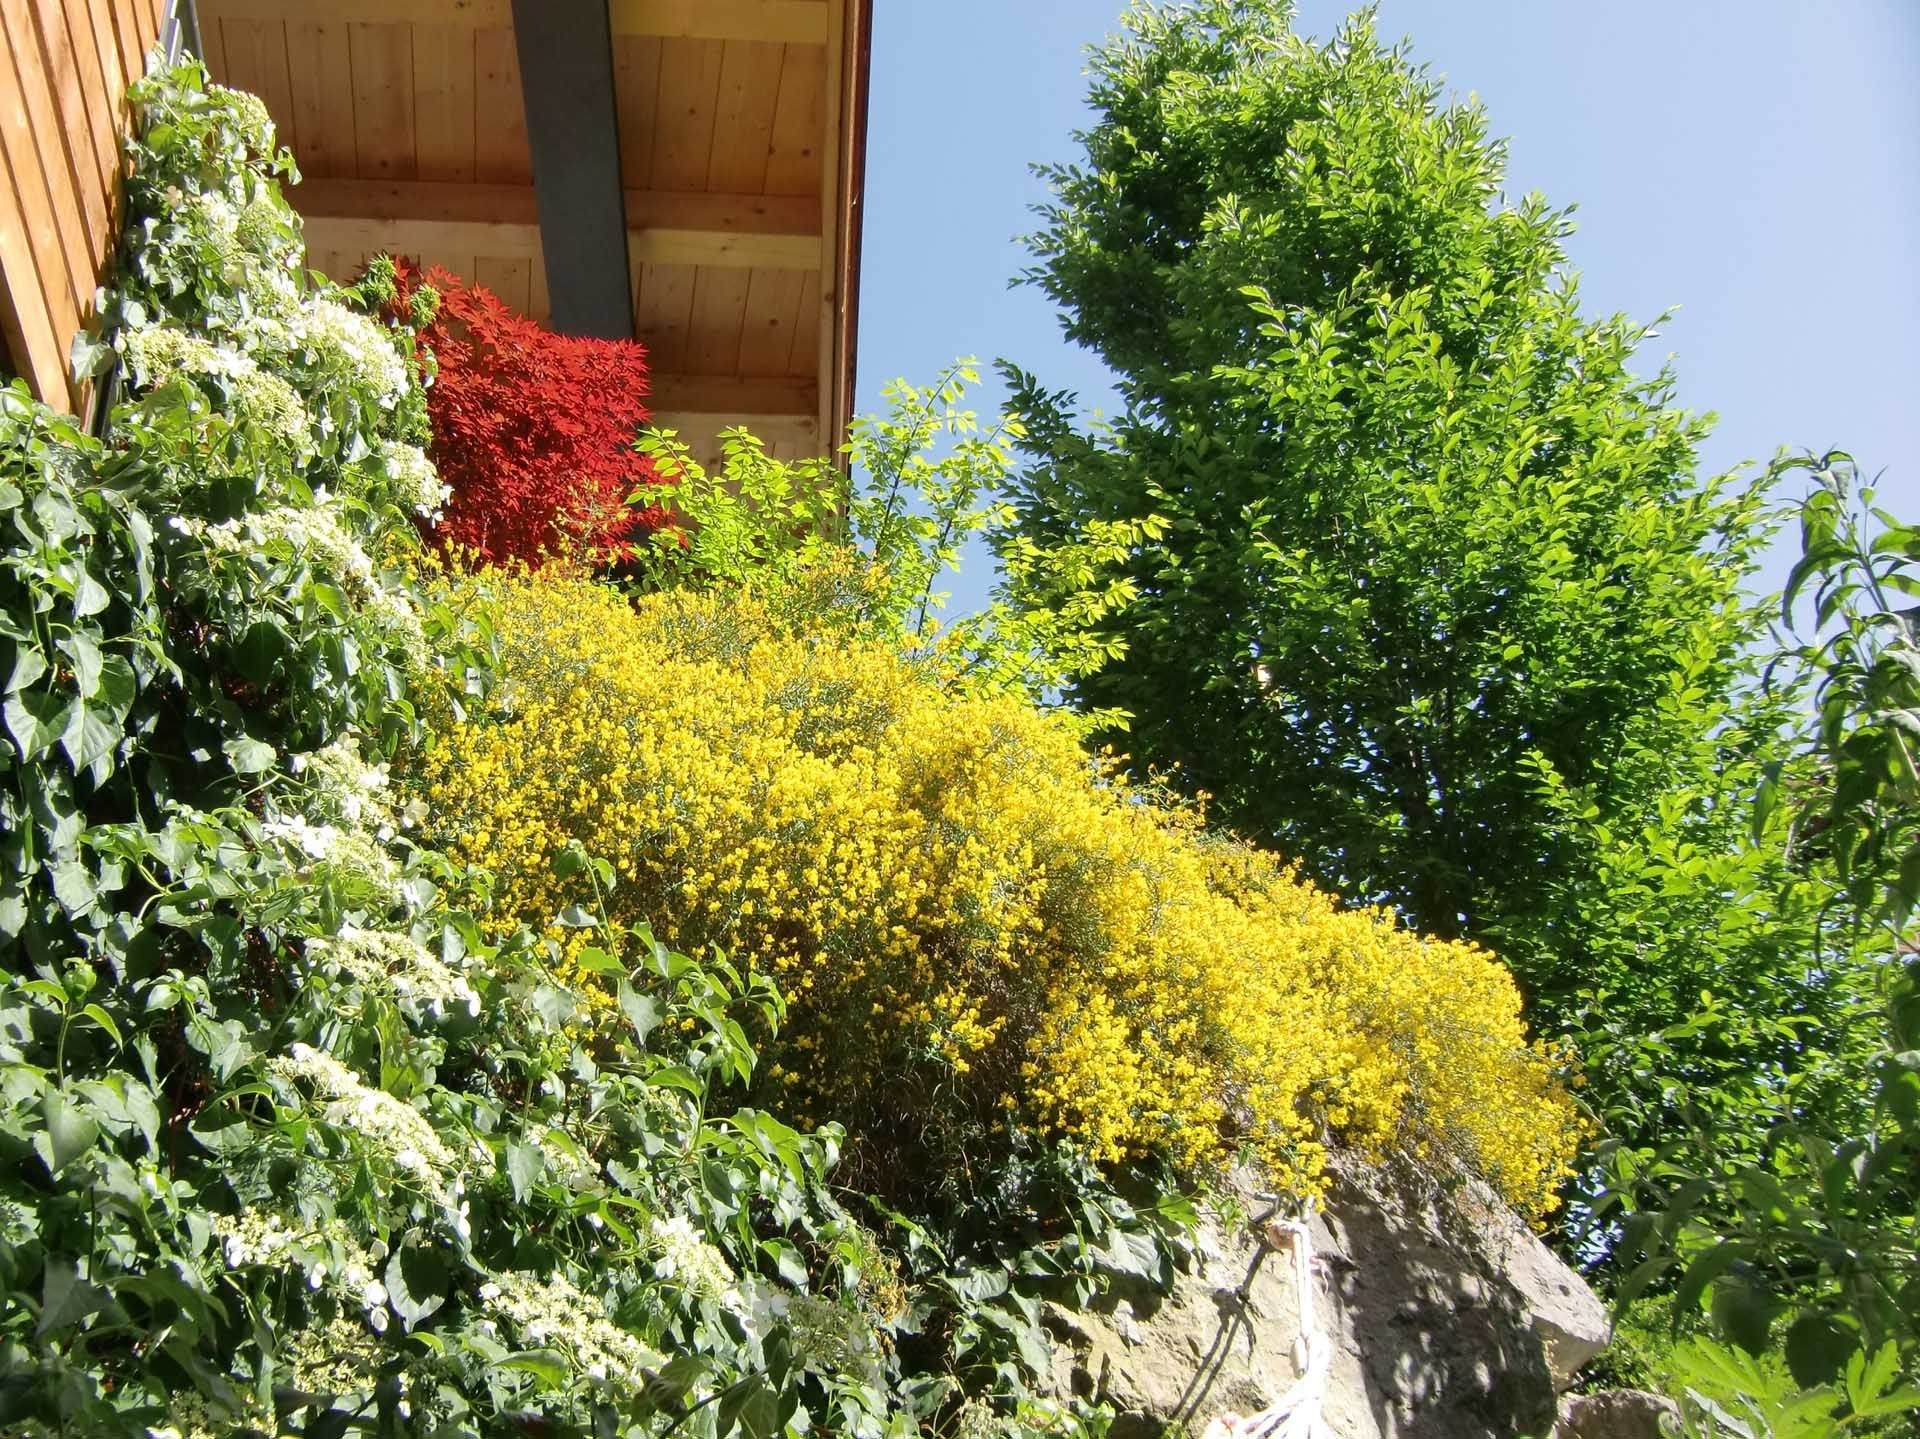 Gartenbau Hannes Laiminger Hopfgarten im Brixental